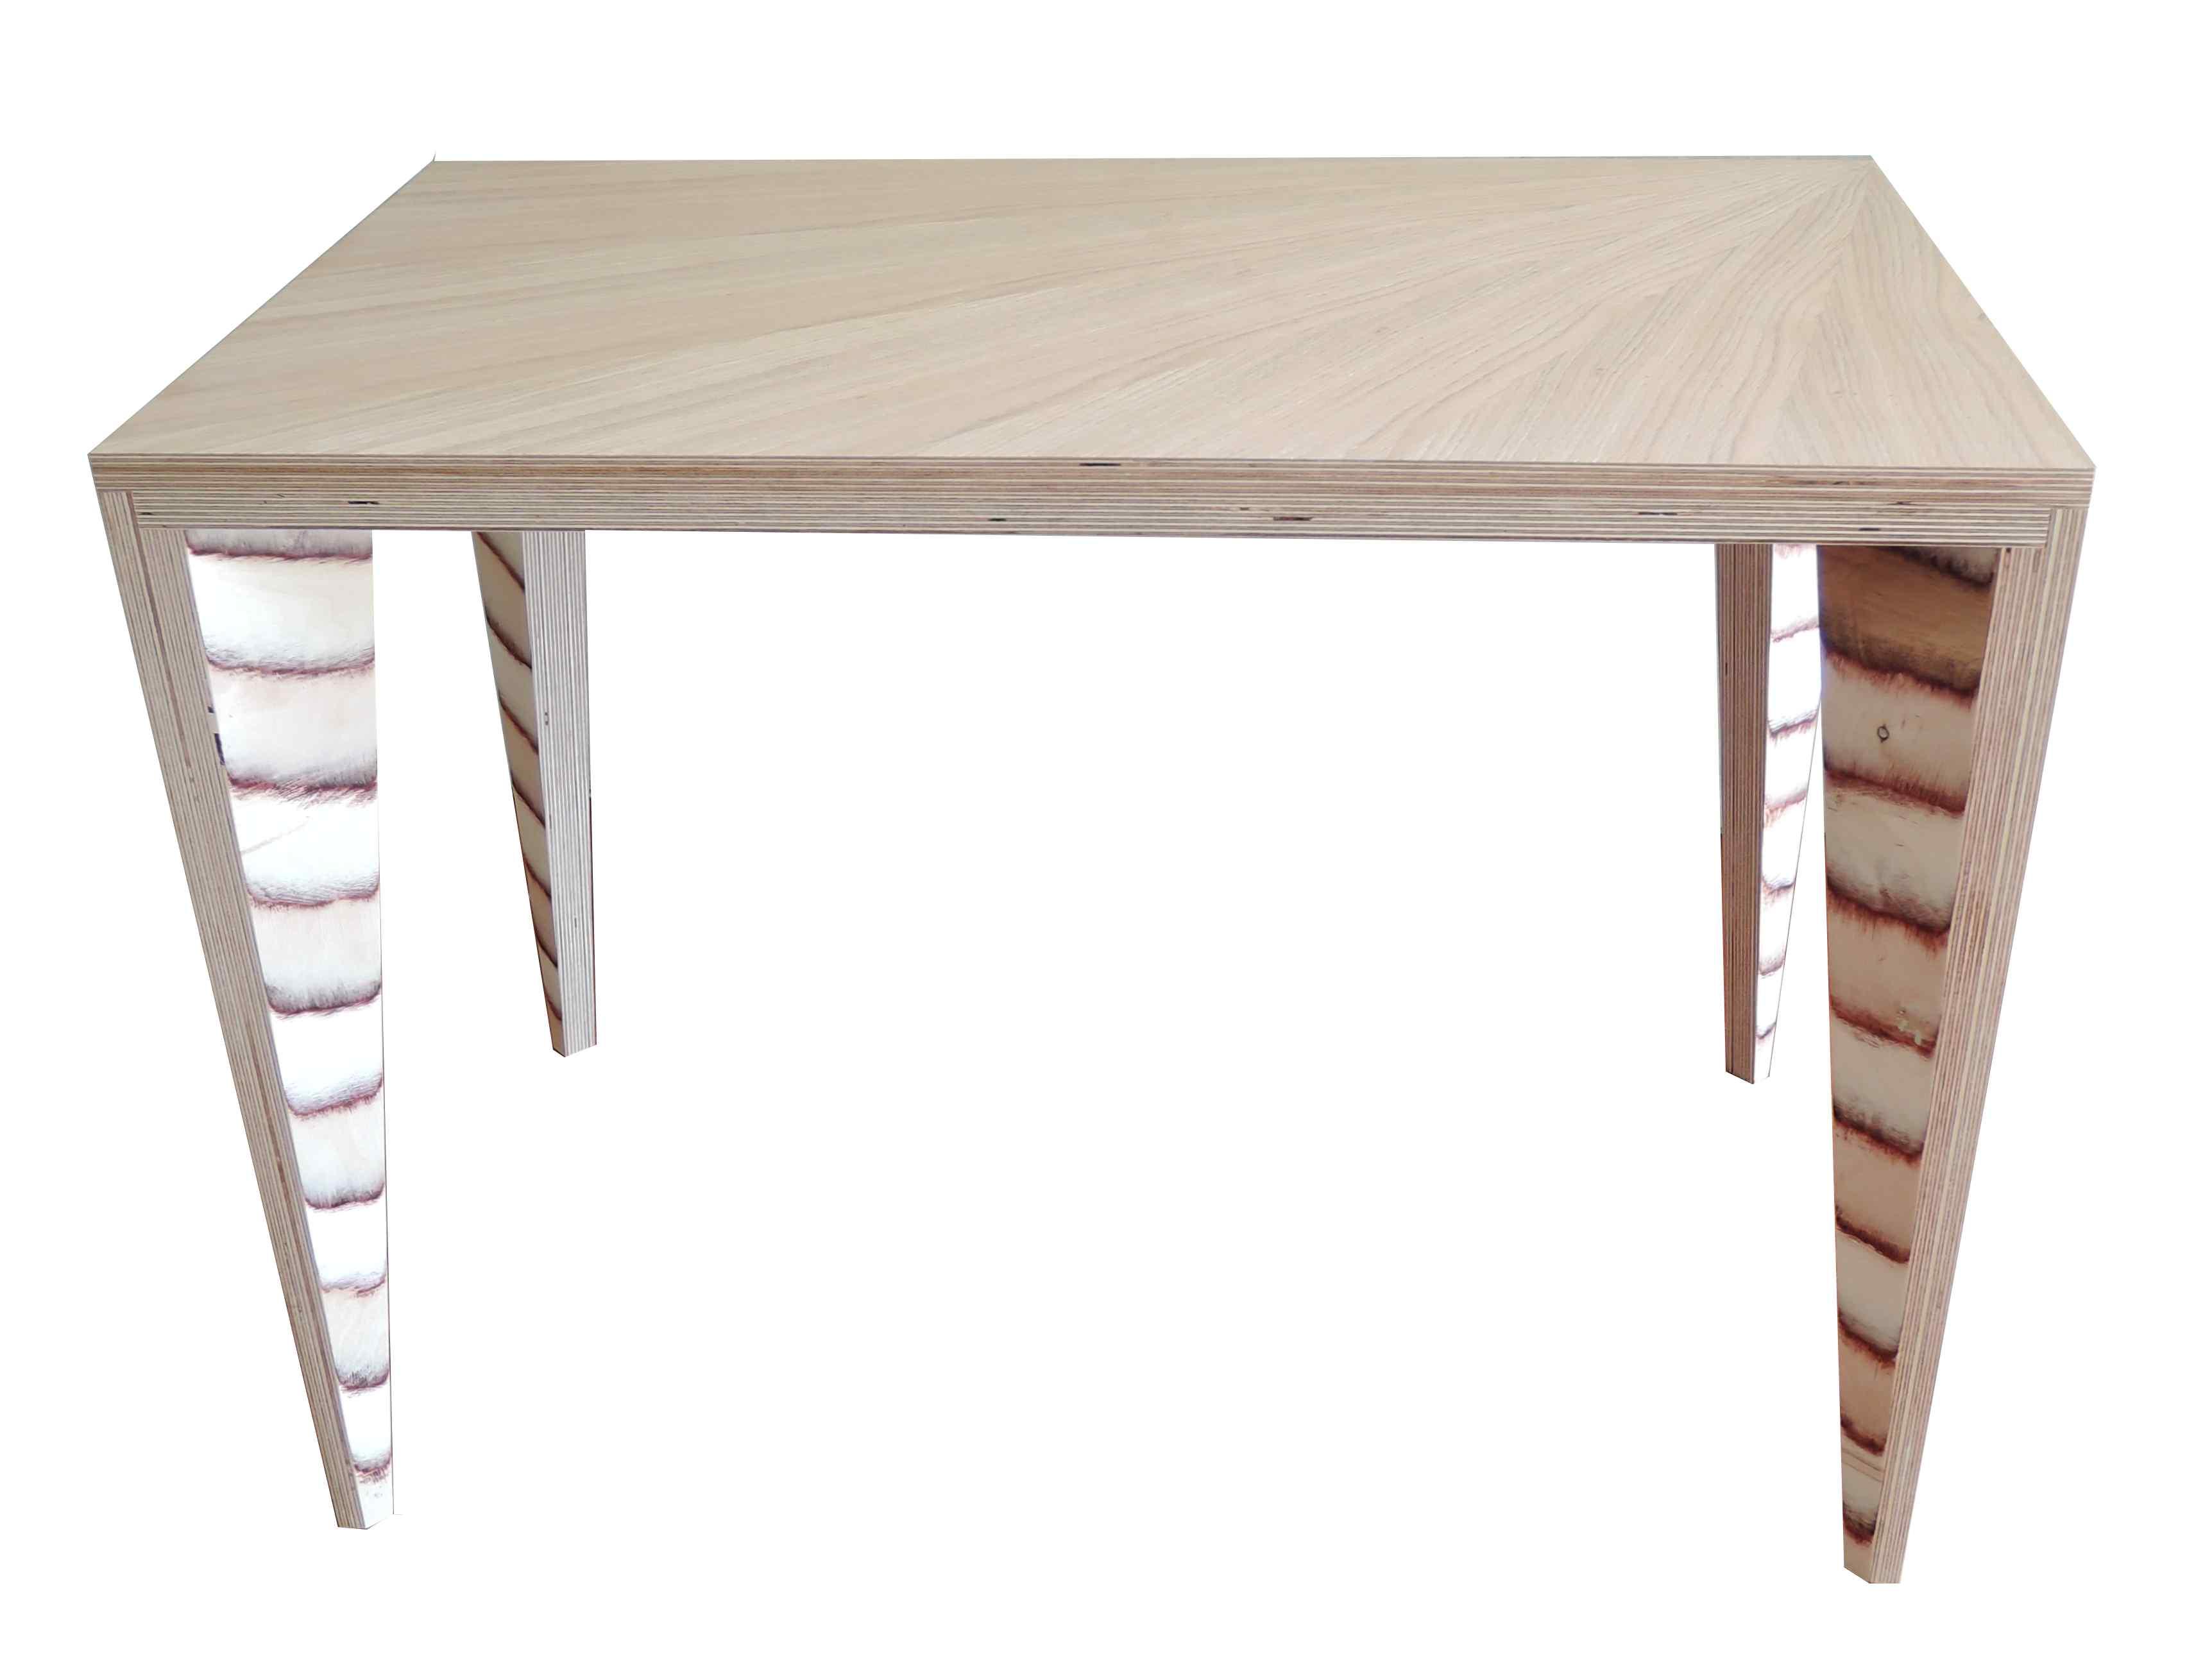 table bout de canap cheap table basse pomax console corbel naturel unouveauu consoles u bouts. Black Bedroom Furniture Sets. Home Design Ideas